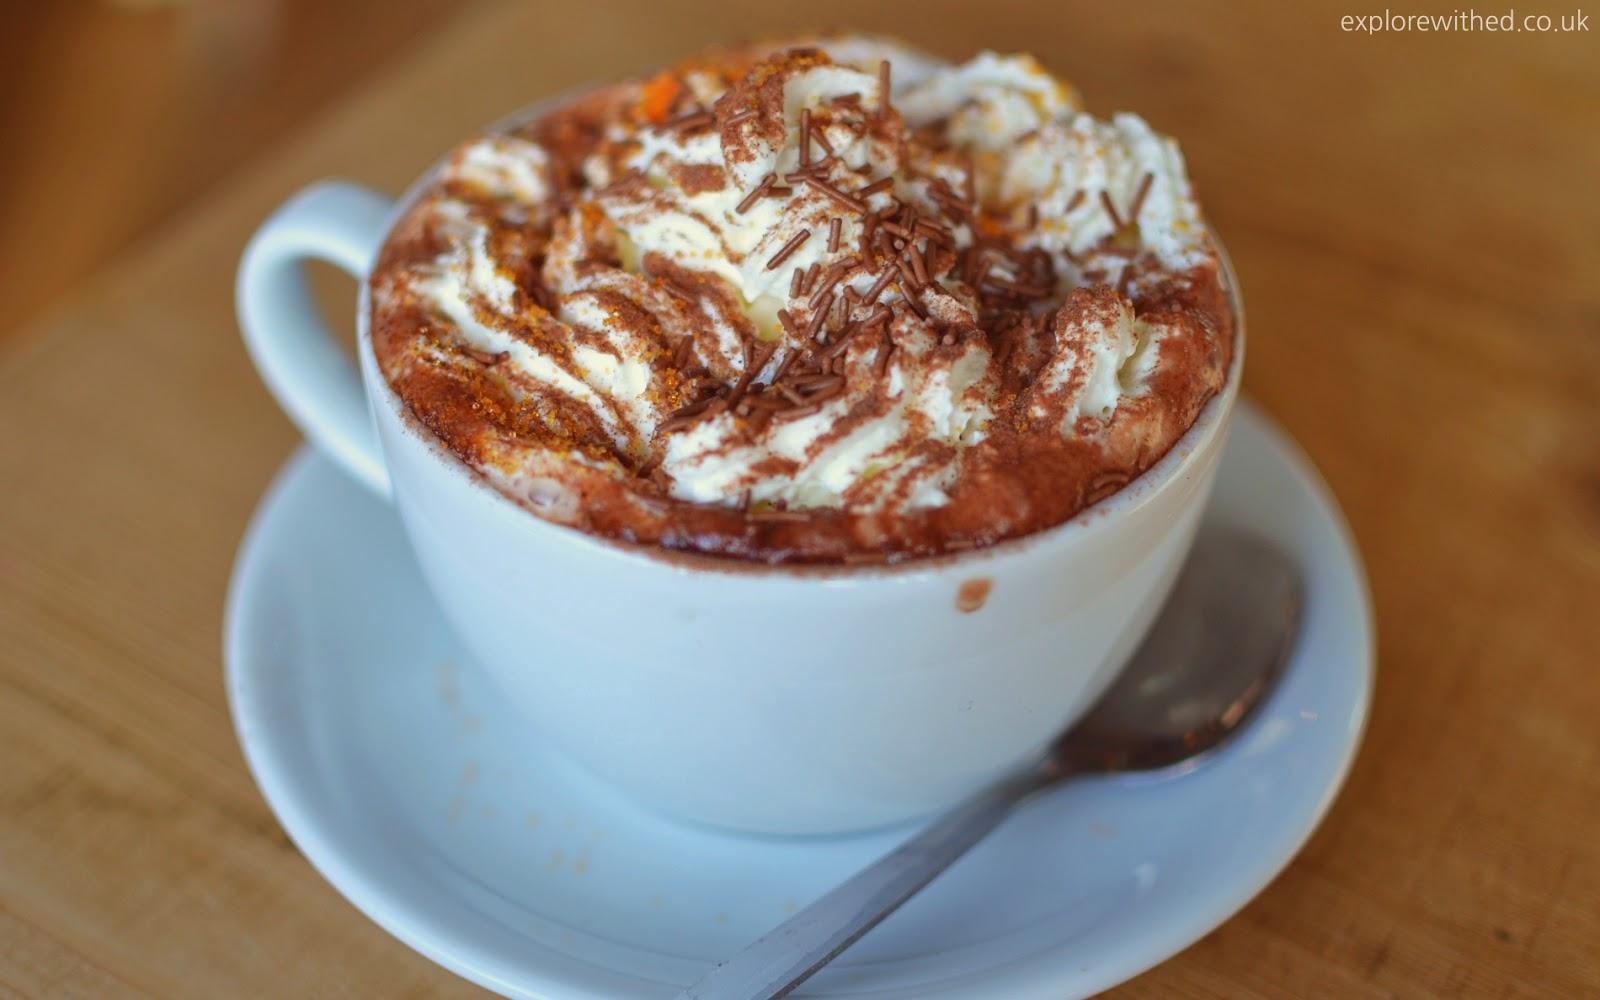 Parc Pantry Hot Chocolate